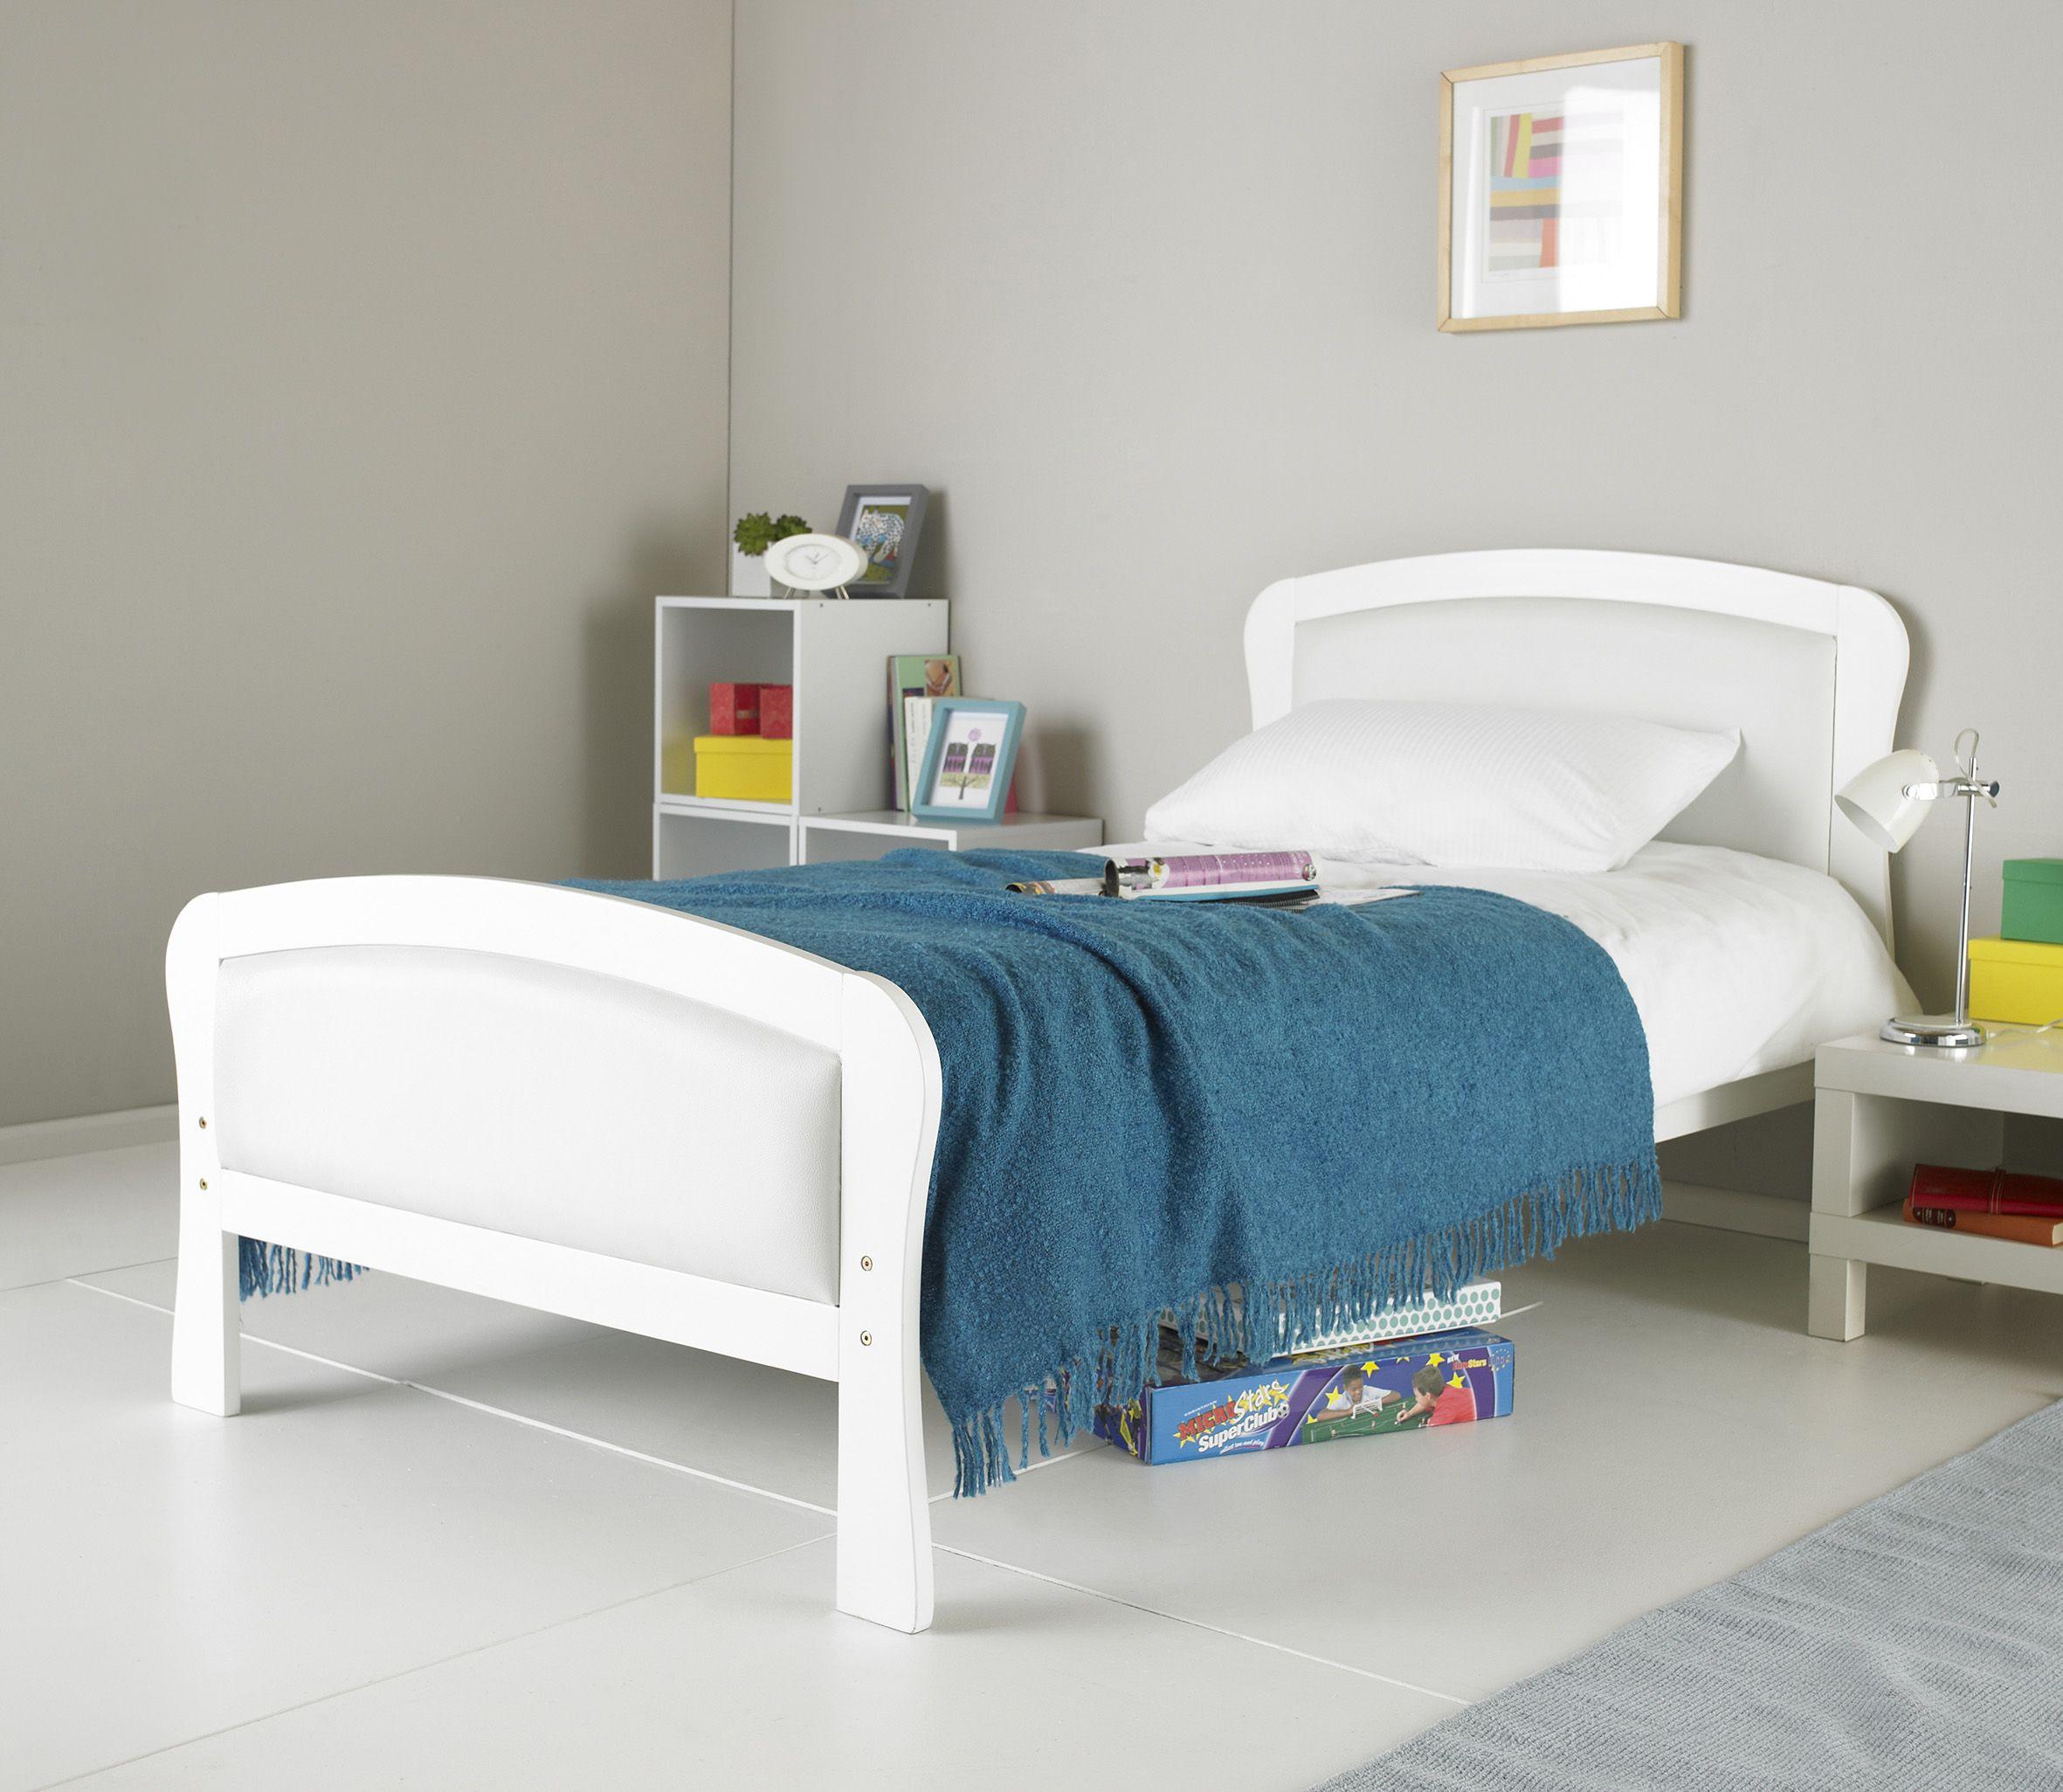 Paddington White Wooden Kids Single Bed With Pu Leather Headboard Leather Headboard Kids Bedroom Headboard